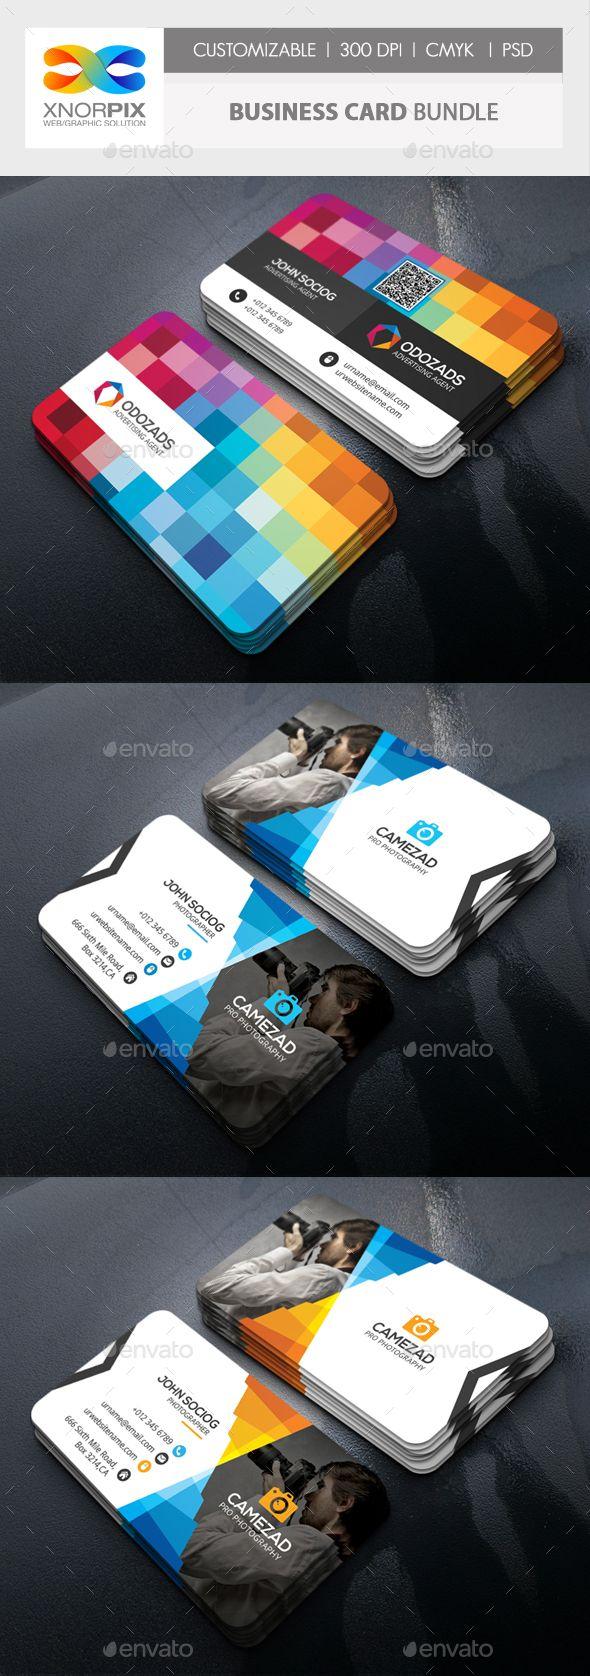 Business card bundle cartes de visita visita e carto business card bundle corporate business cards download here https reheart Choice Image